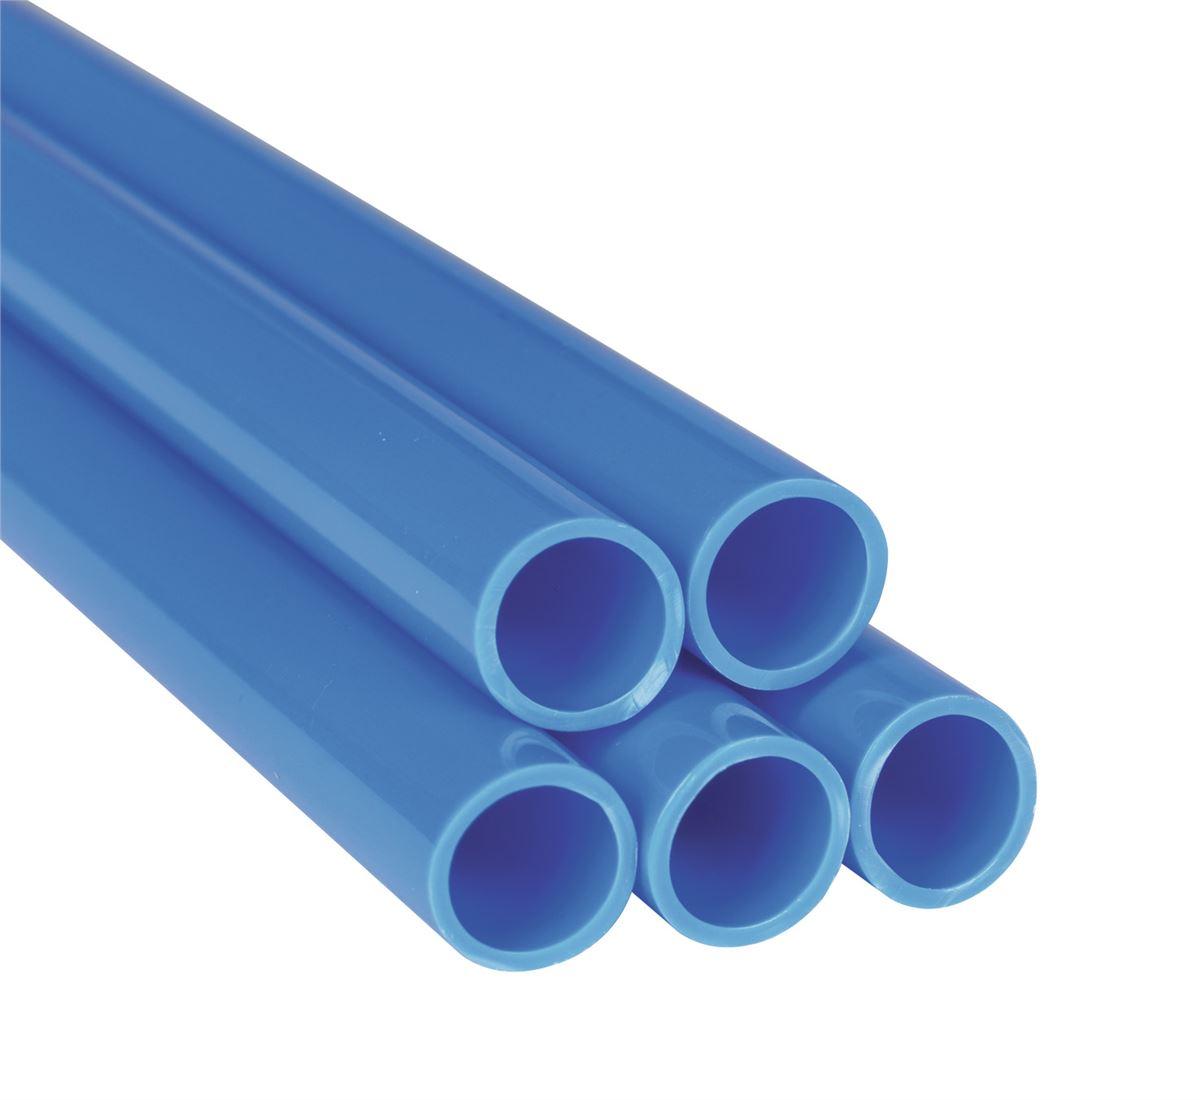 4 mm x 30MTR Rouge Silicone Tuyau Vide Tube Silicone Air